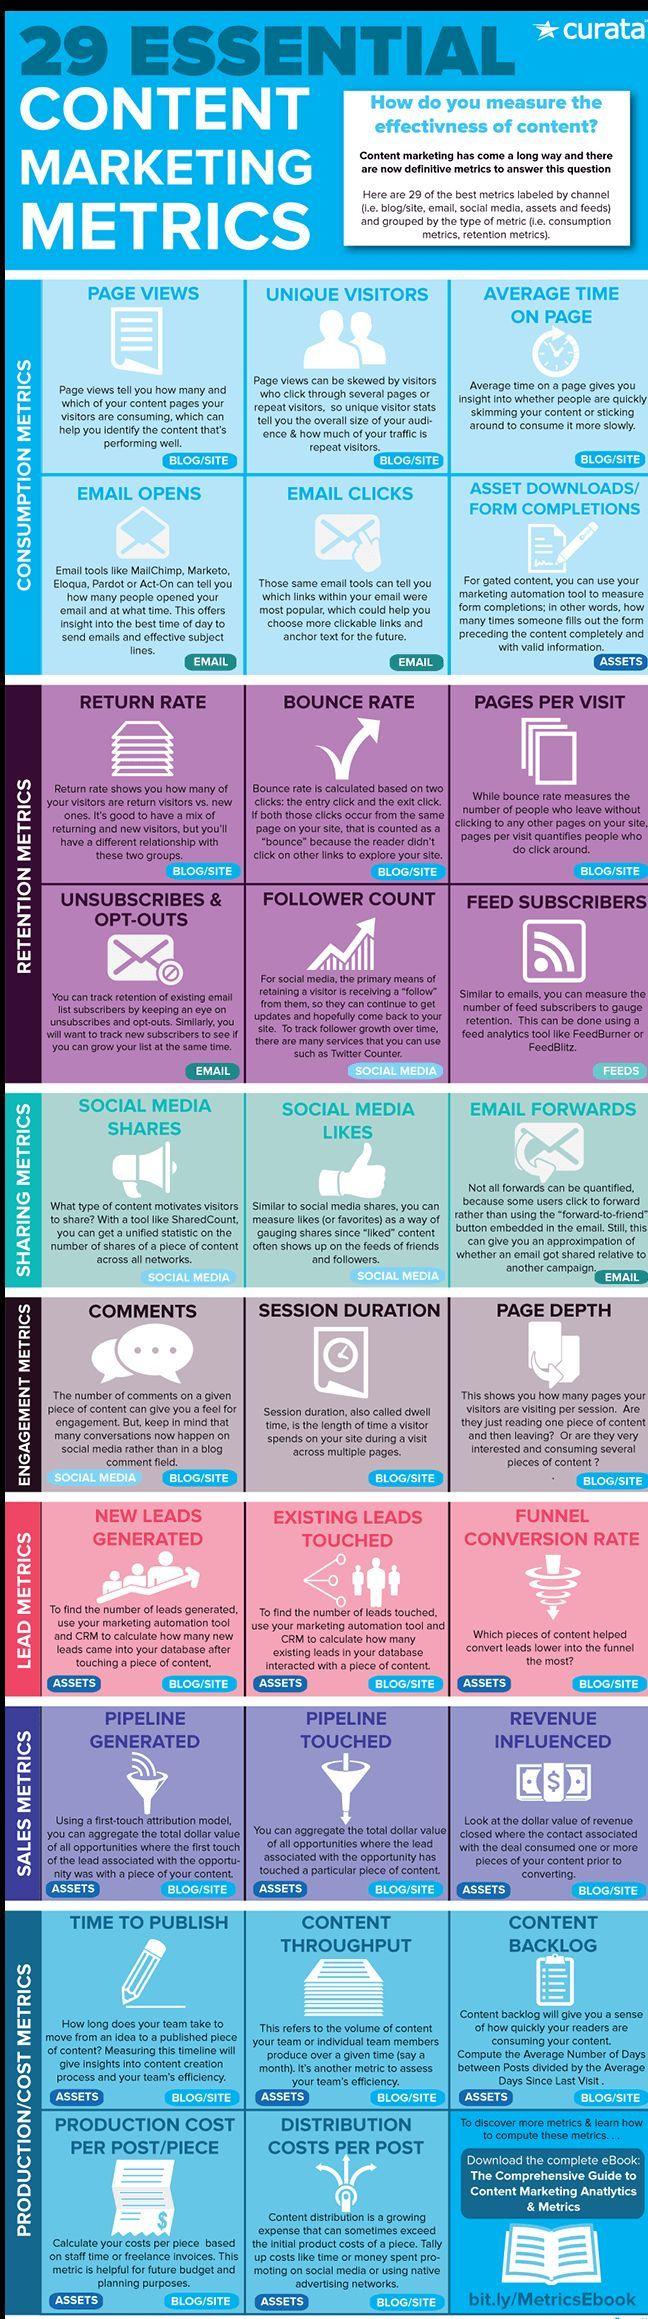 29 Essential #Content #Marketing Metrics for Business Success [Infographic]